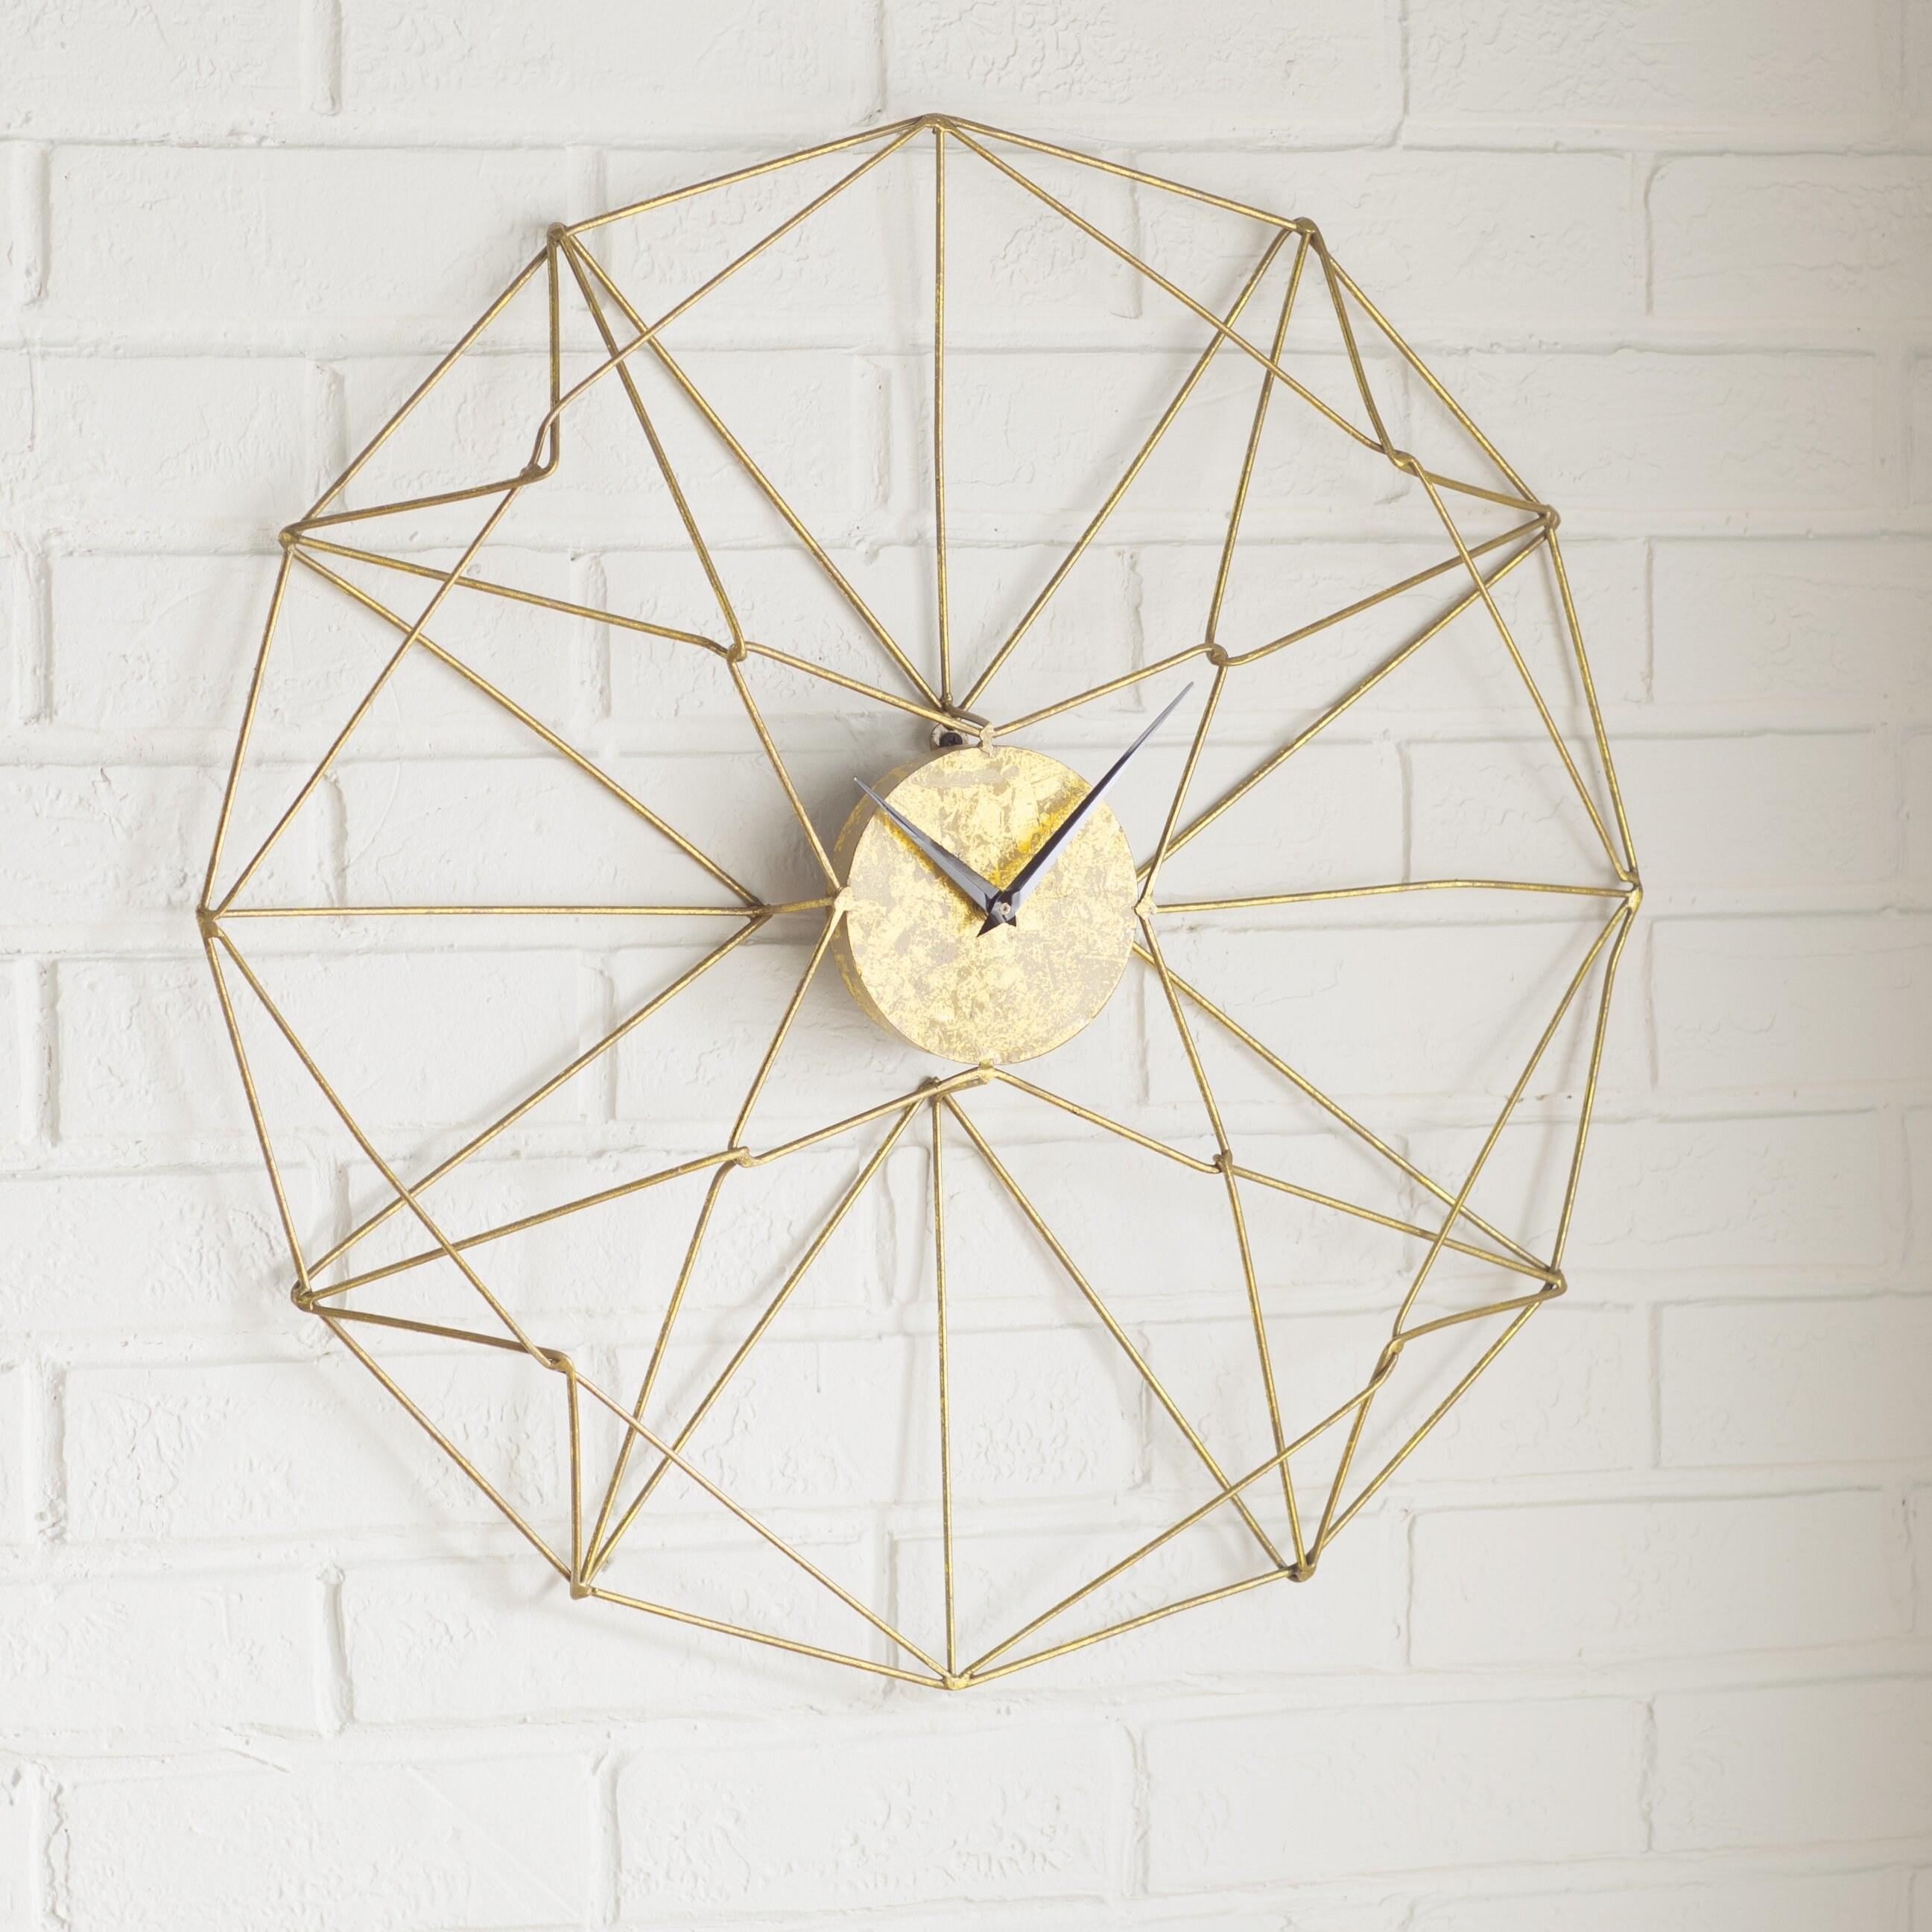 Circular clock with golden metal pattern and black clock hands